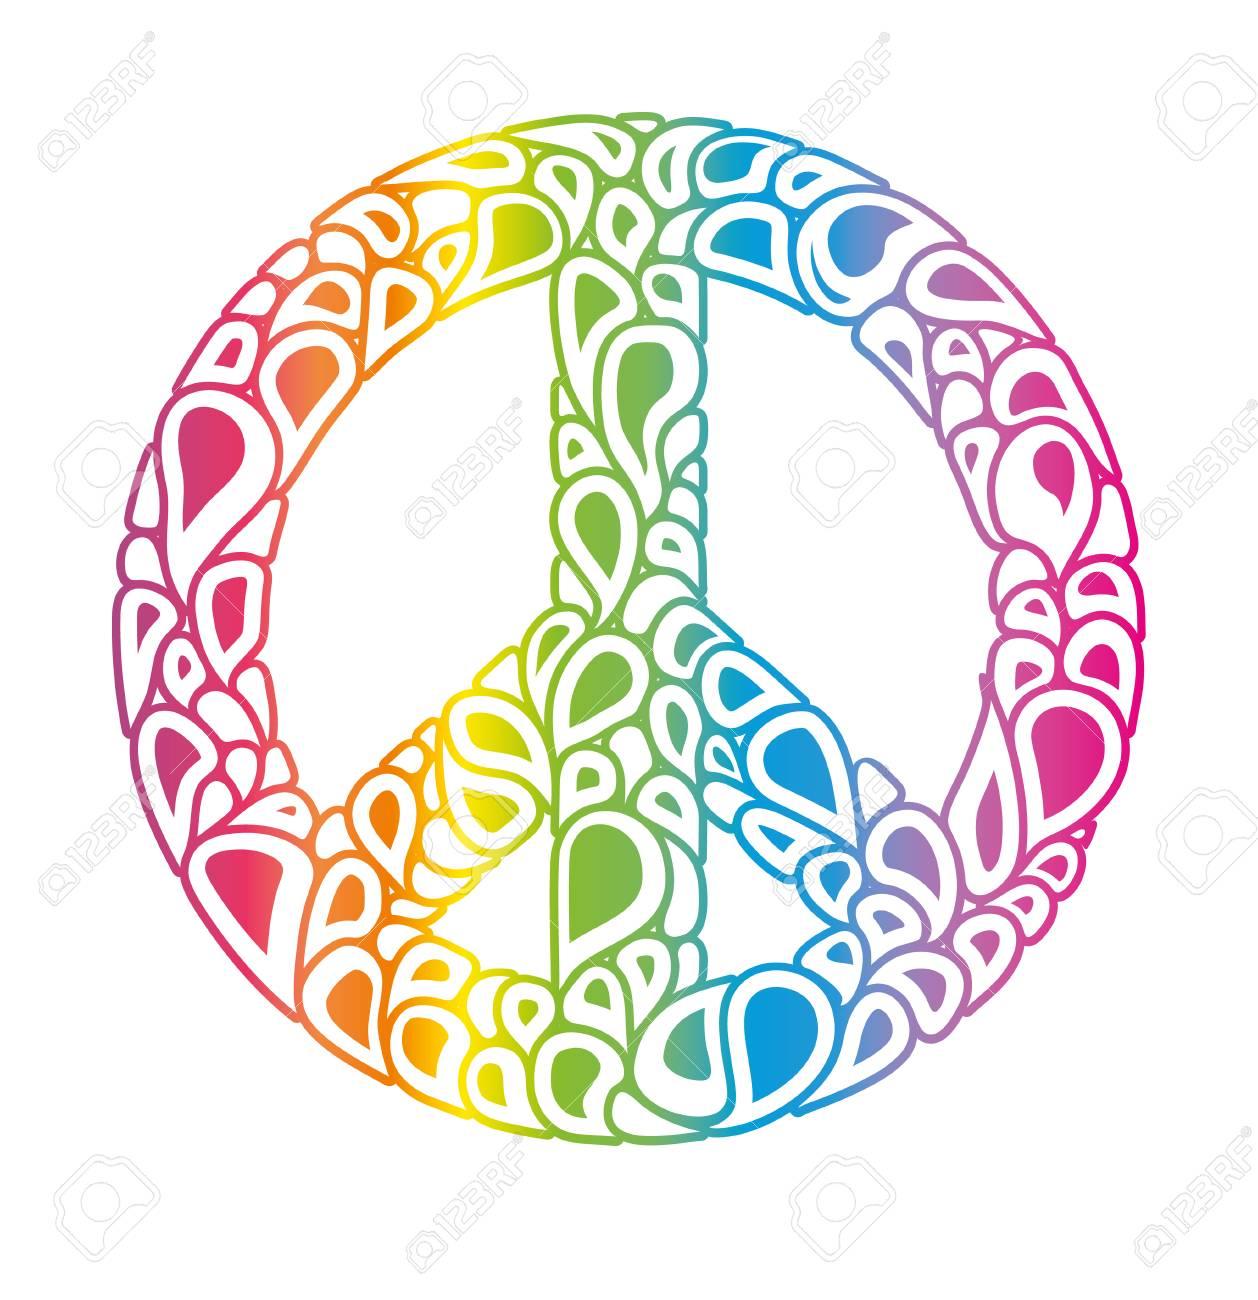 Symbol of peace  Peace sign consists of rainbow bubbles drops